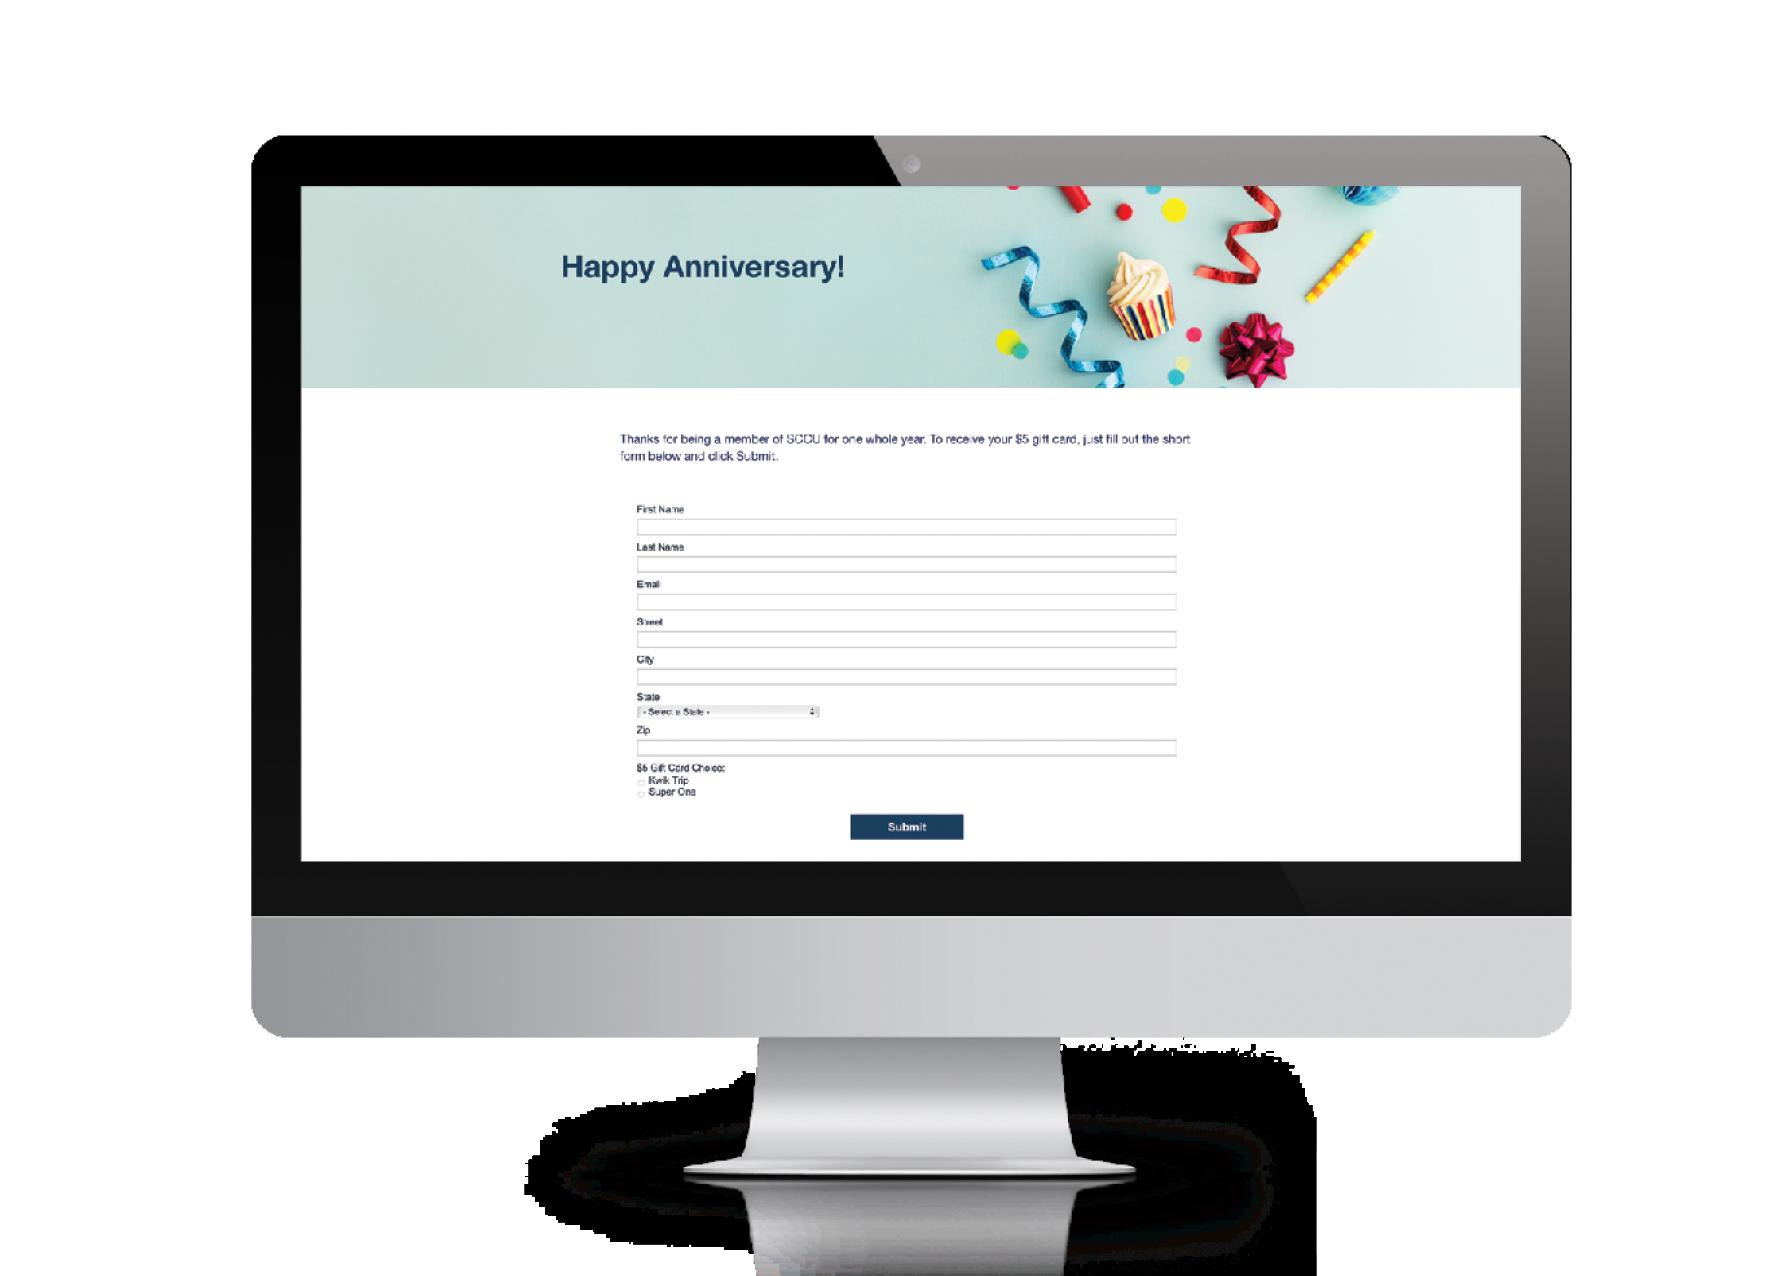 Superior Choice Credit Union Marketing Automation Campaign